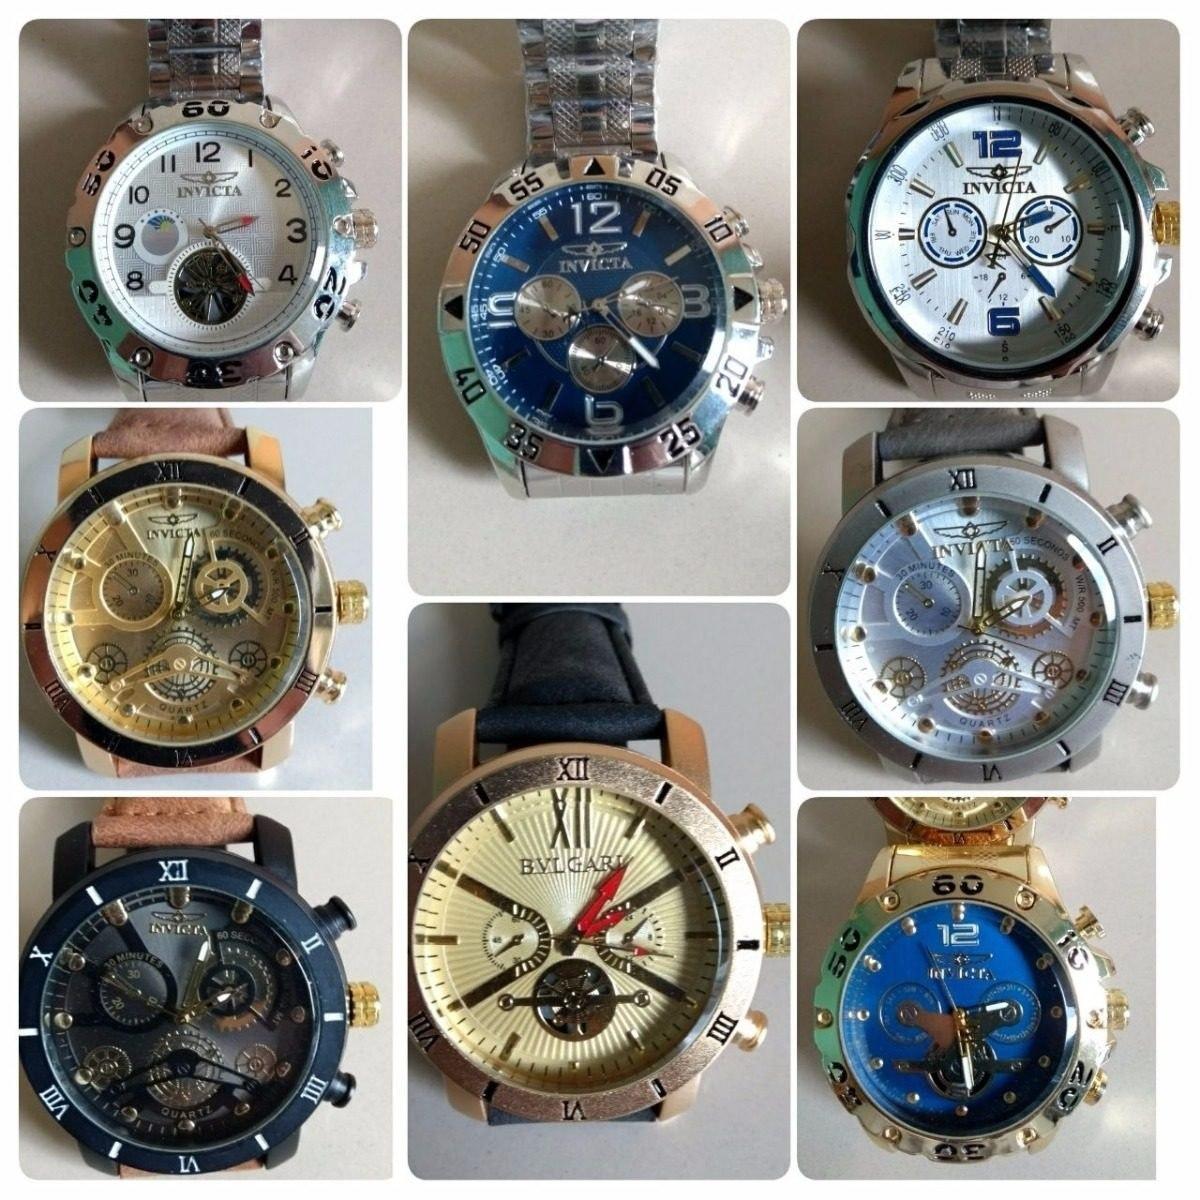 0d1dc5f28a0 Kit 10 Relógio Masculino Dourado Luxo P  Revender + Brinde - R  189 ...